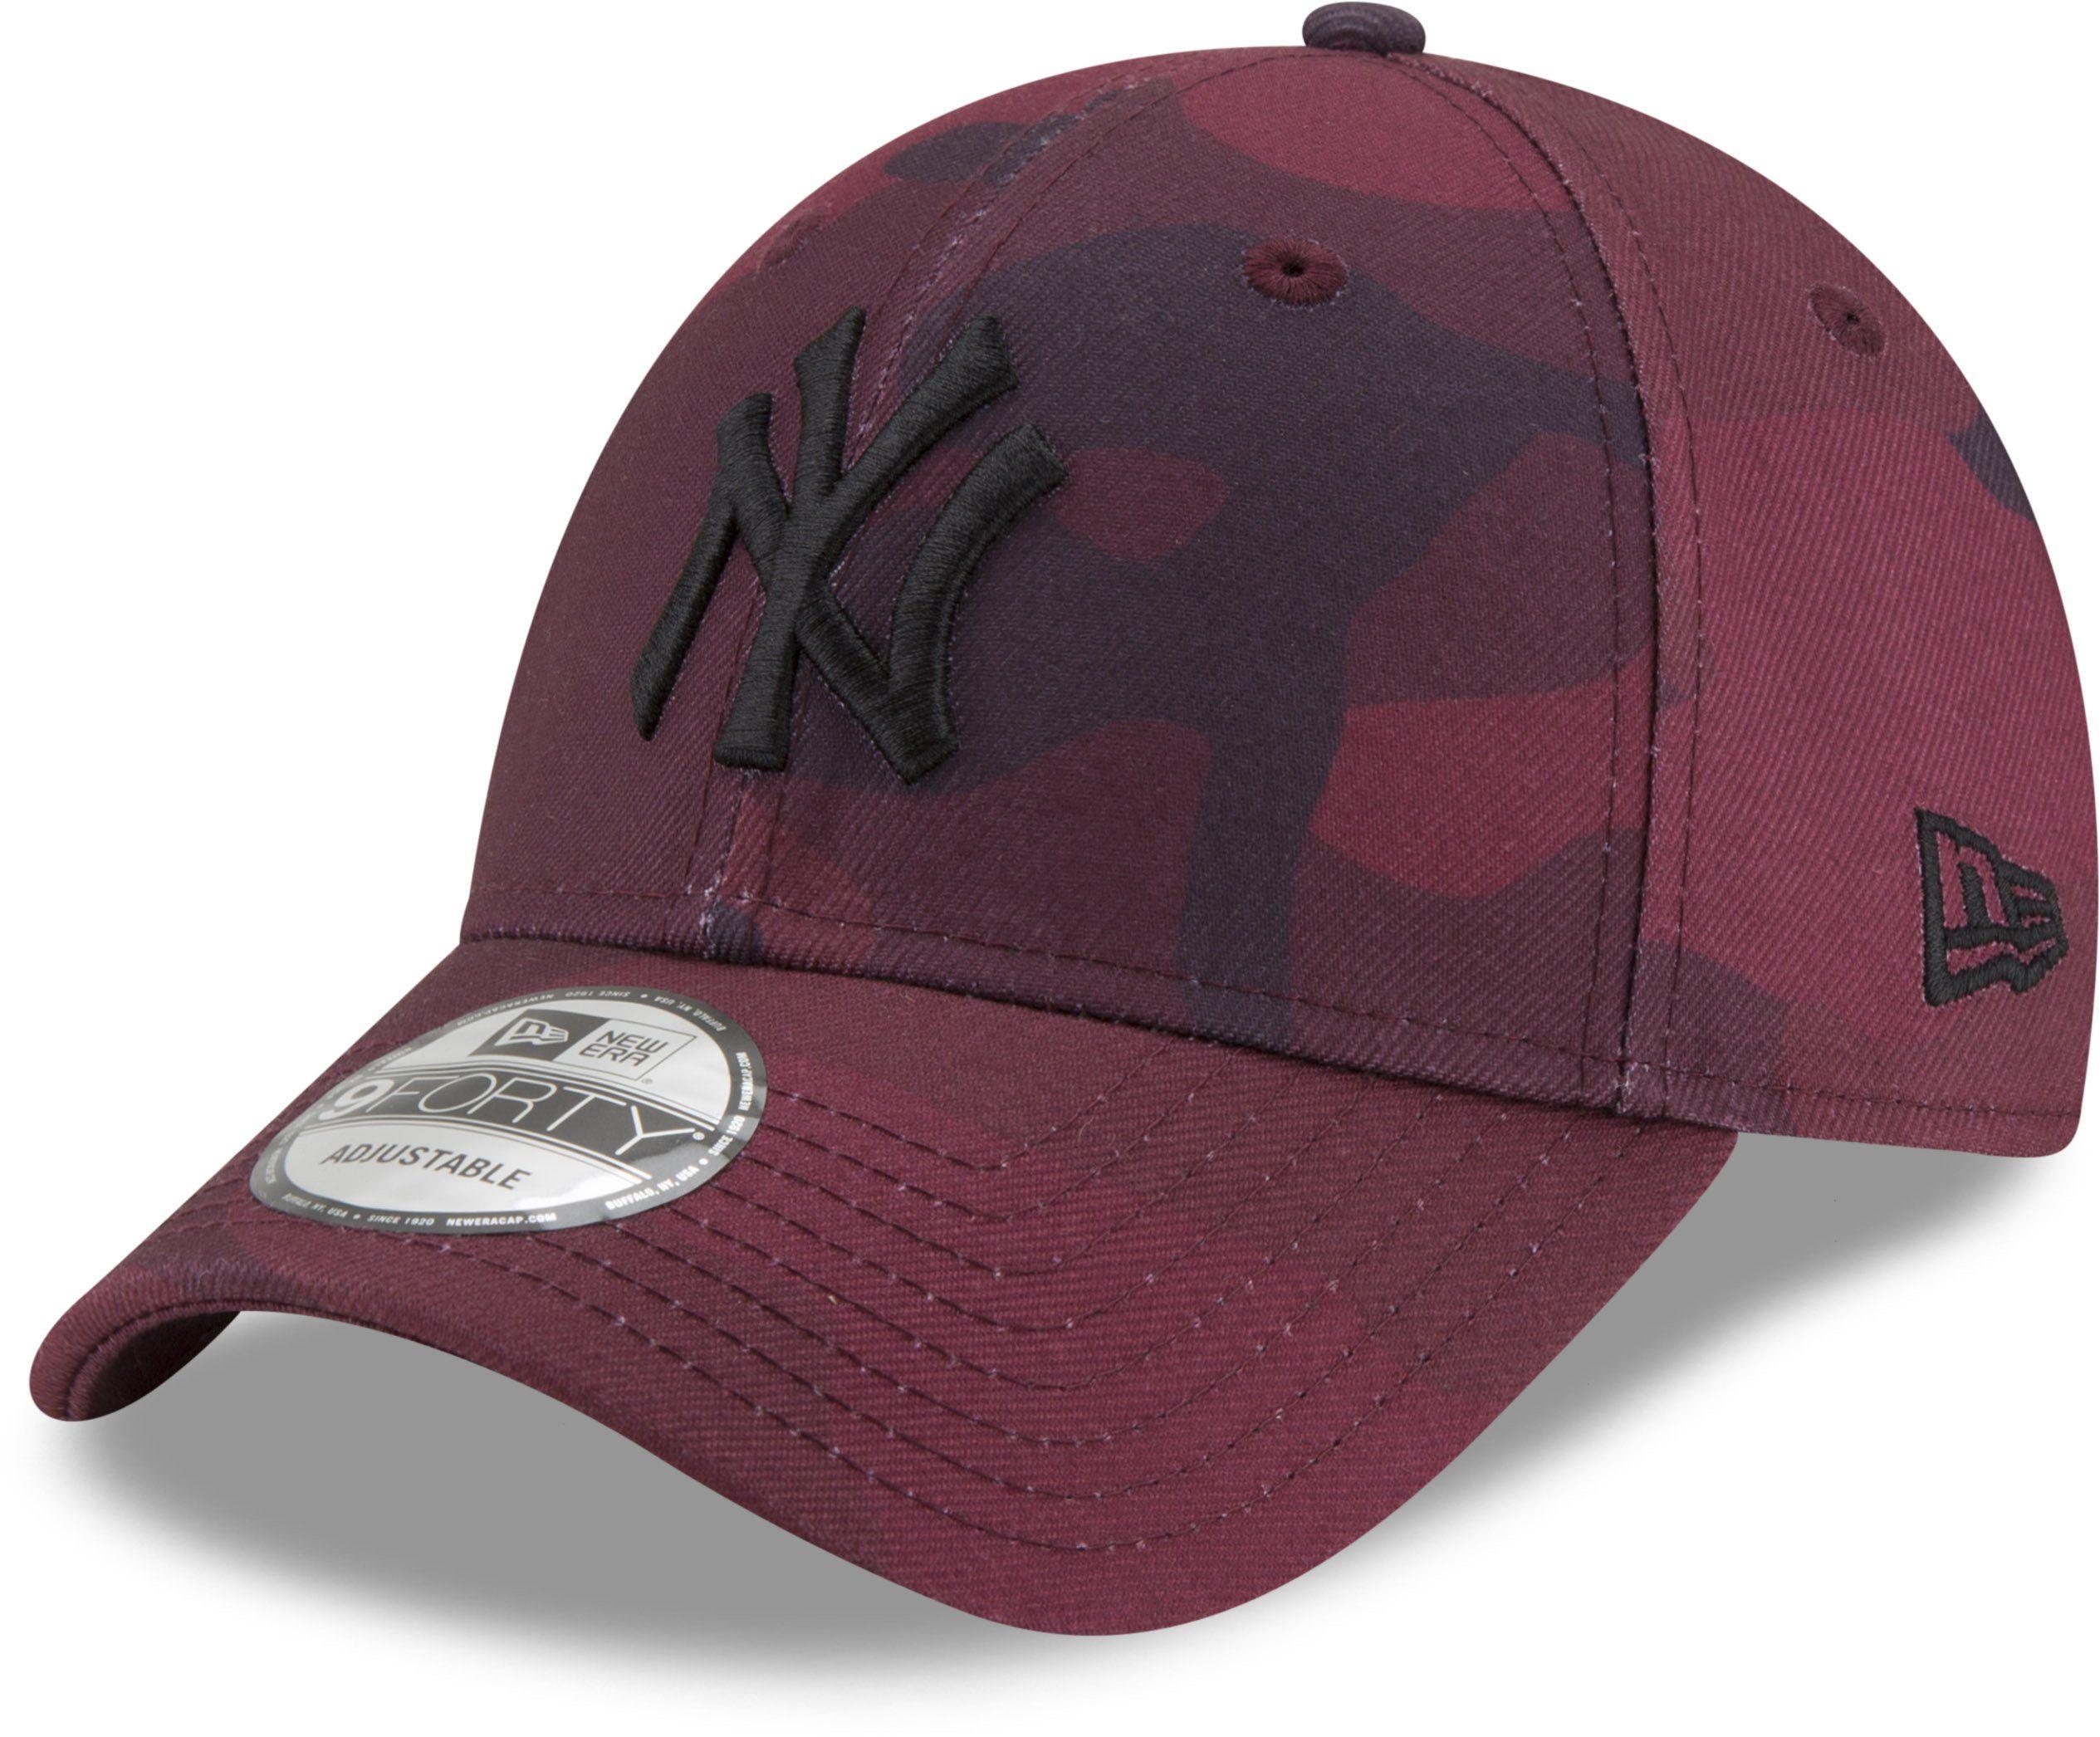 7ae7f8033543dc New York Yankees New Era 940 Maroon Camo Baseball Cap – lovemycap ...